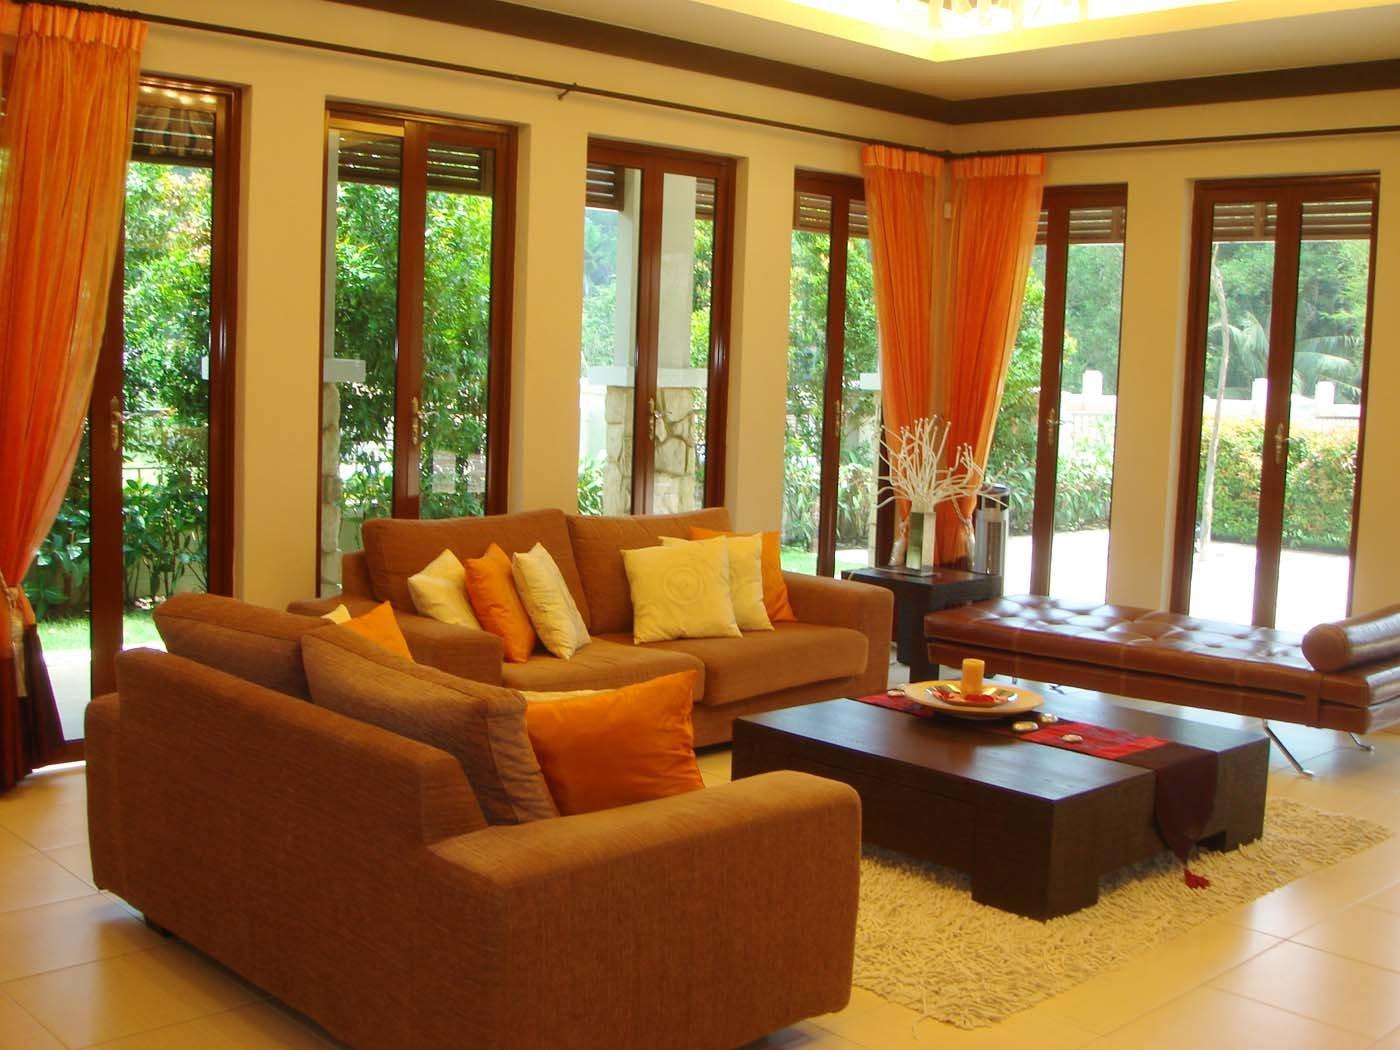 Interior design and decorating - House curtains design pictures ...